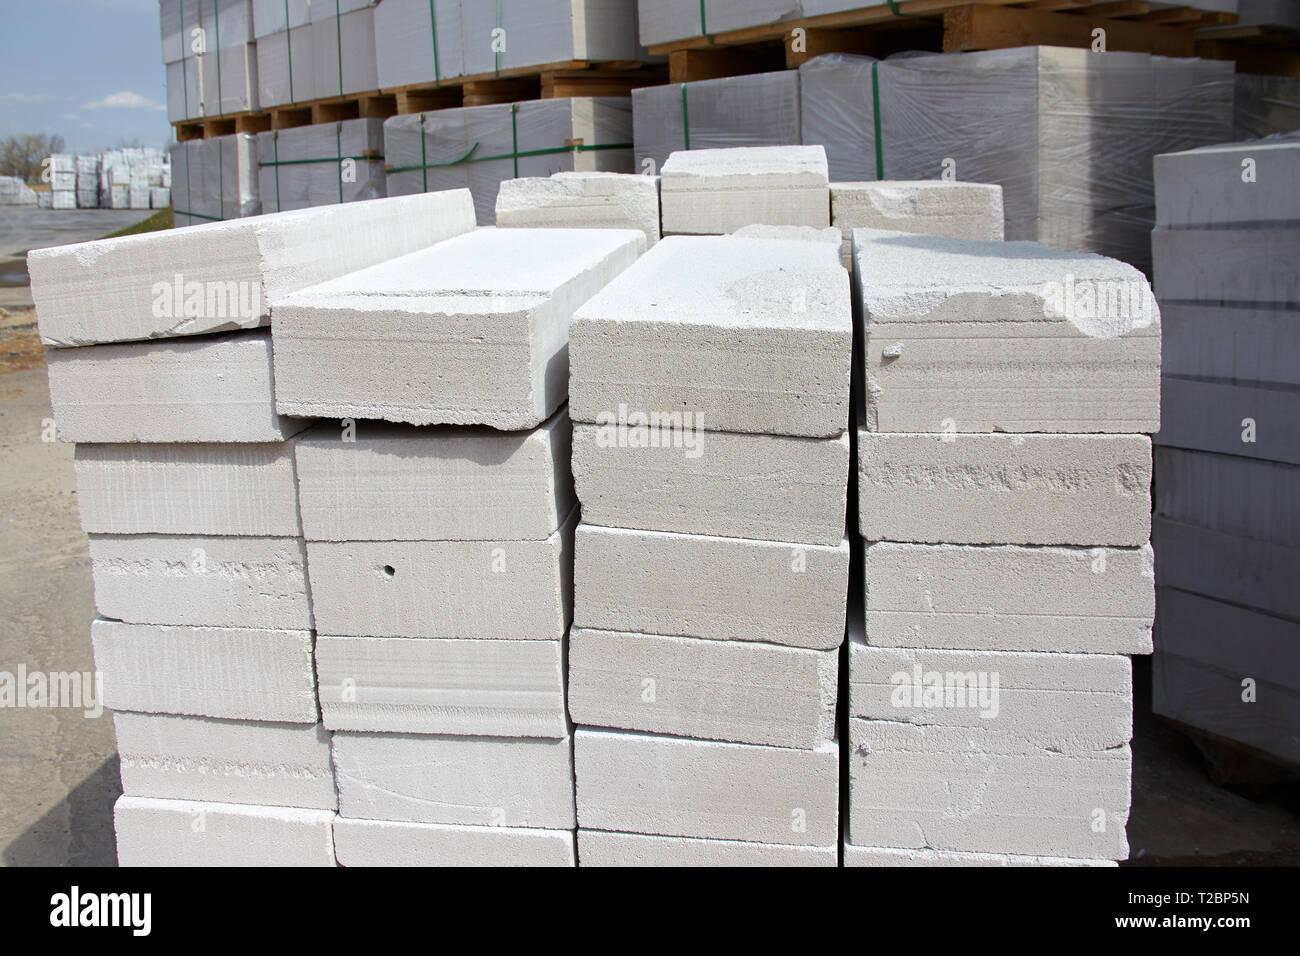 Lightweight Concrete Blocks Stock Photos & Lightweight